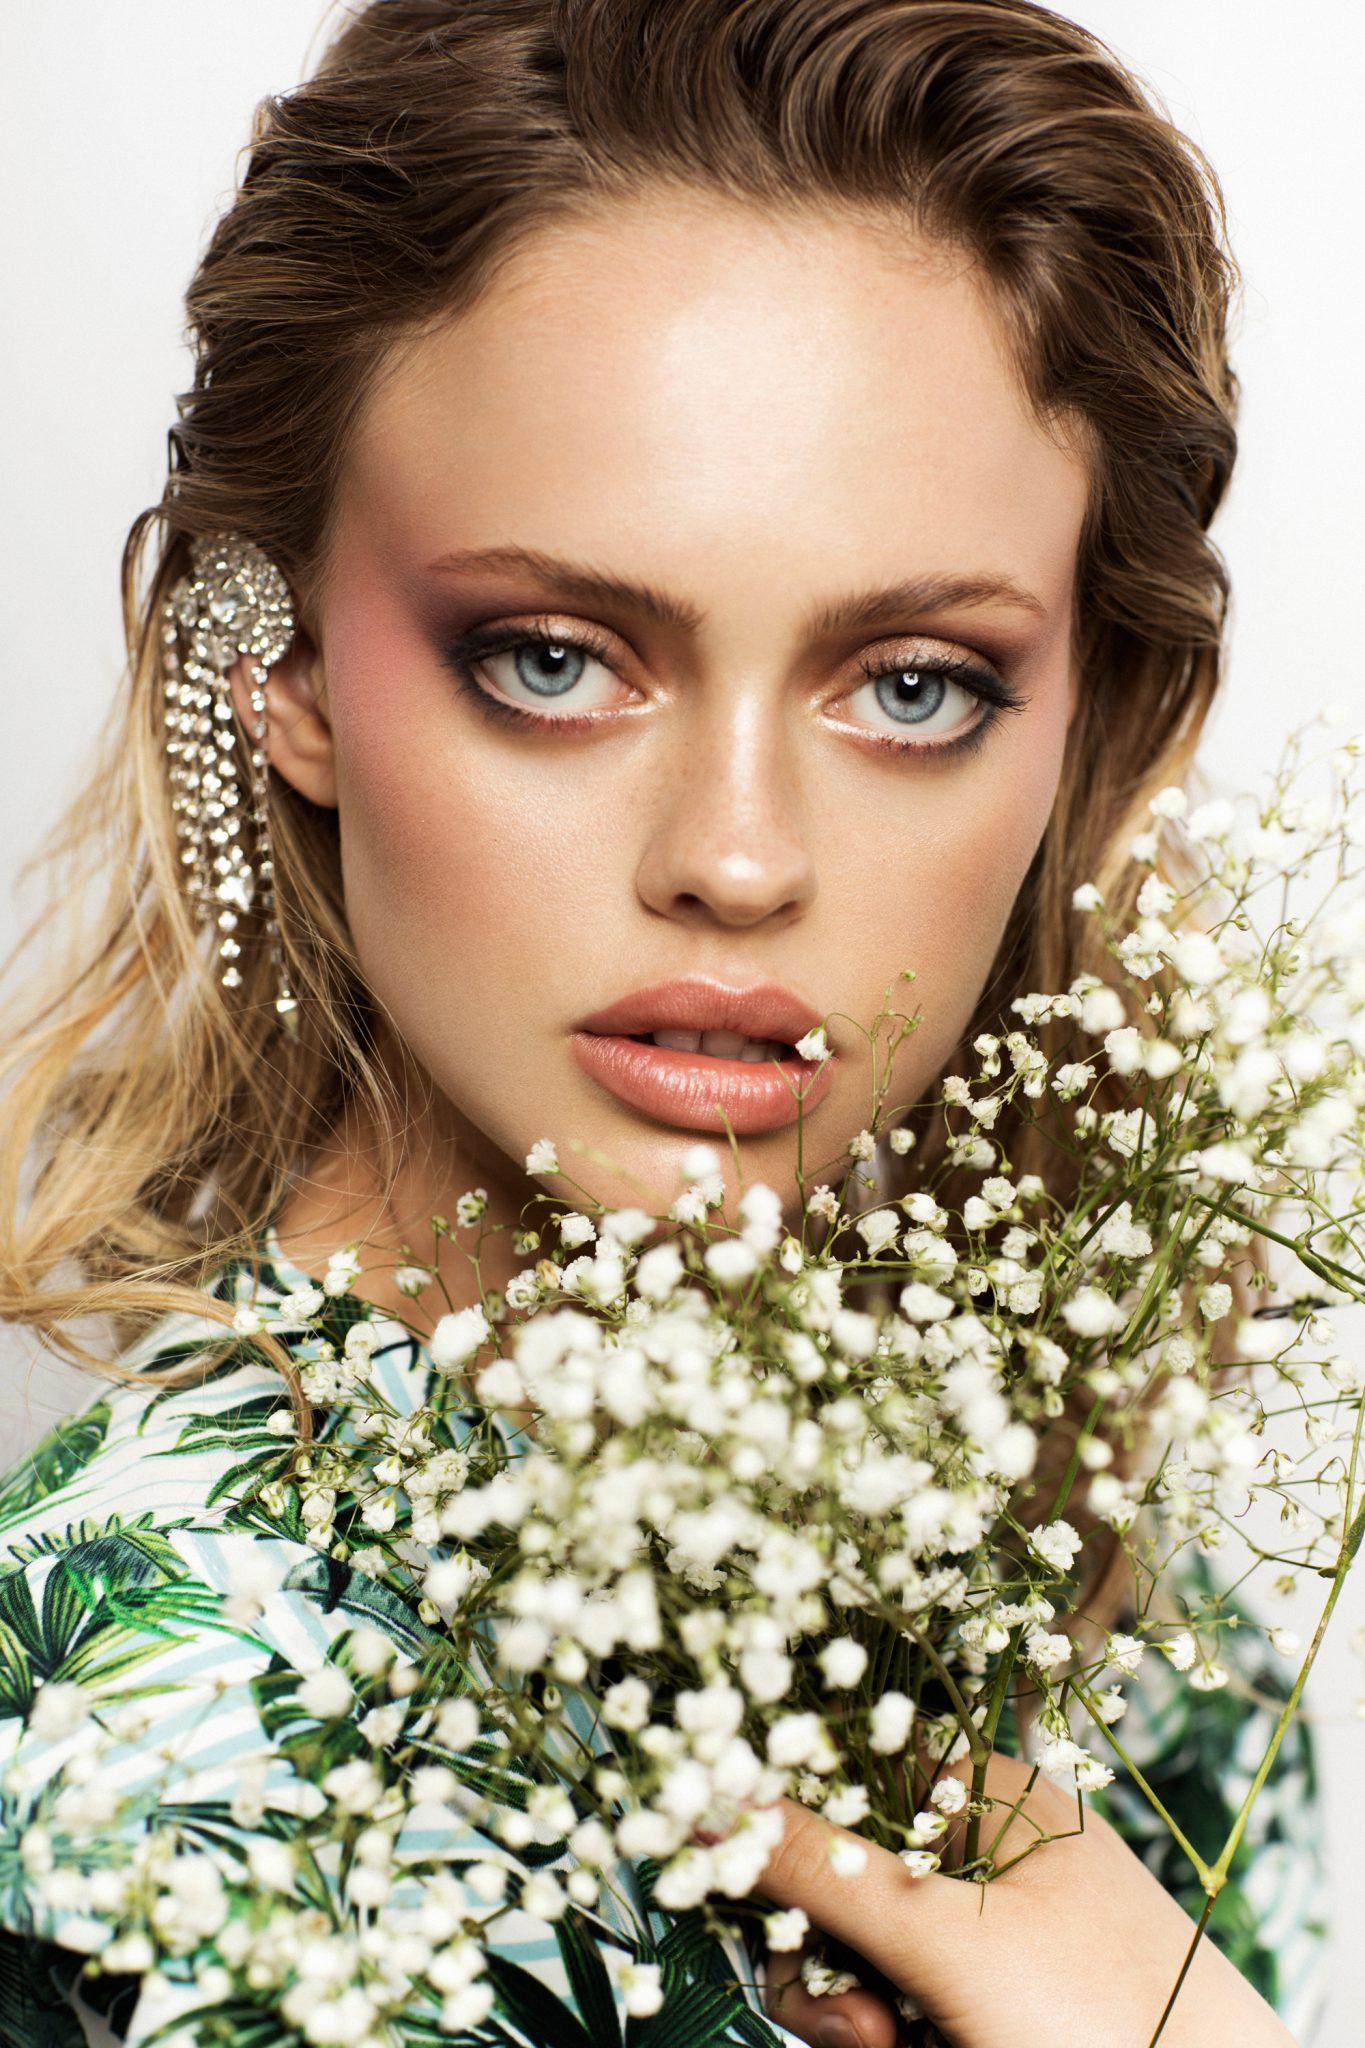 tina picard effet papillon beauty fashion story le dernier etage magazine webzine editorial webditorial shooting